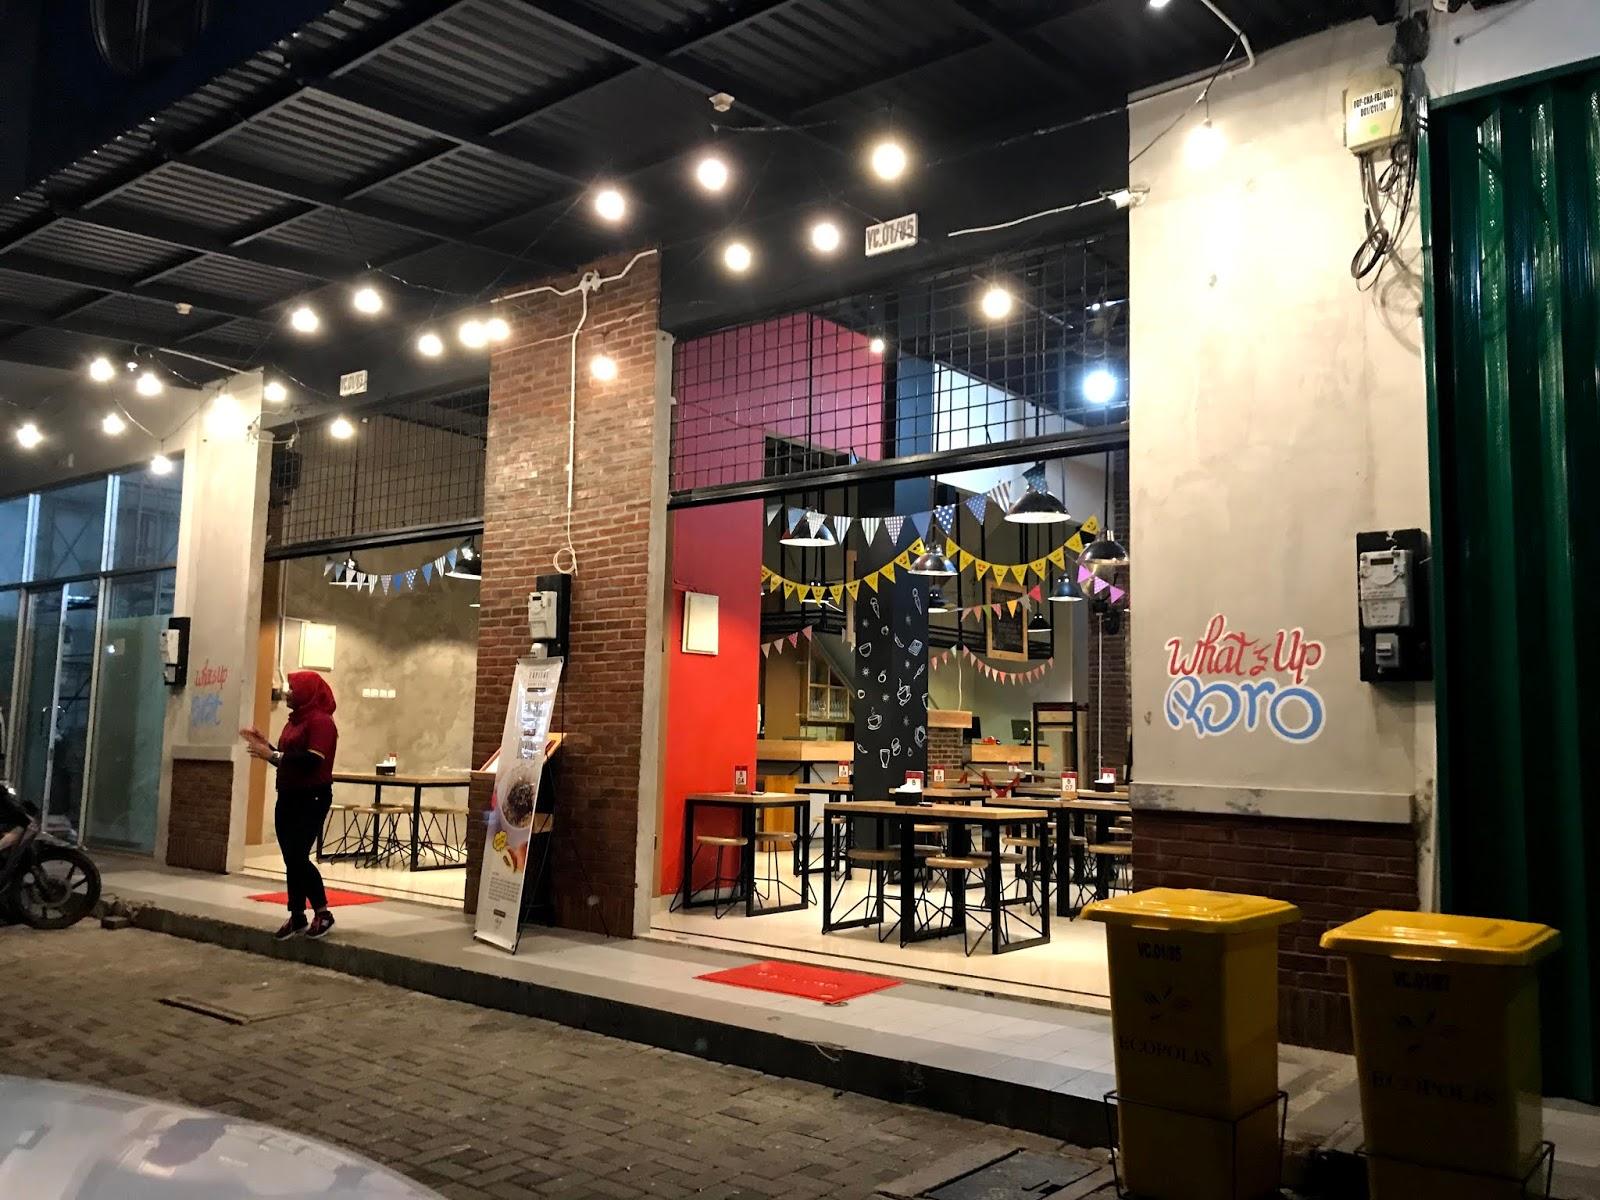 Cari Tempat Ngumpul? Di Whats'up Cafe Aja